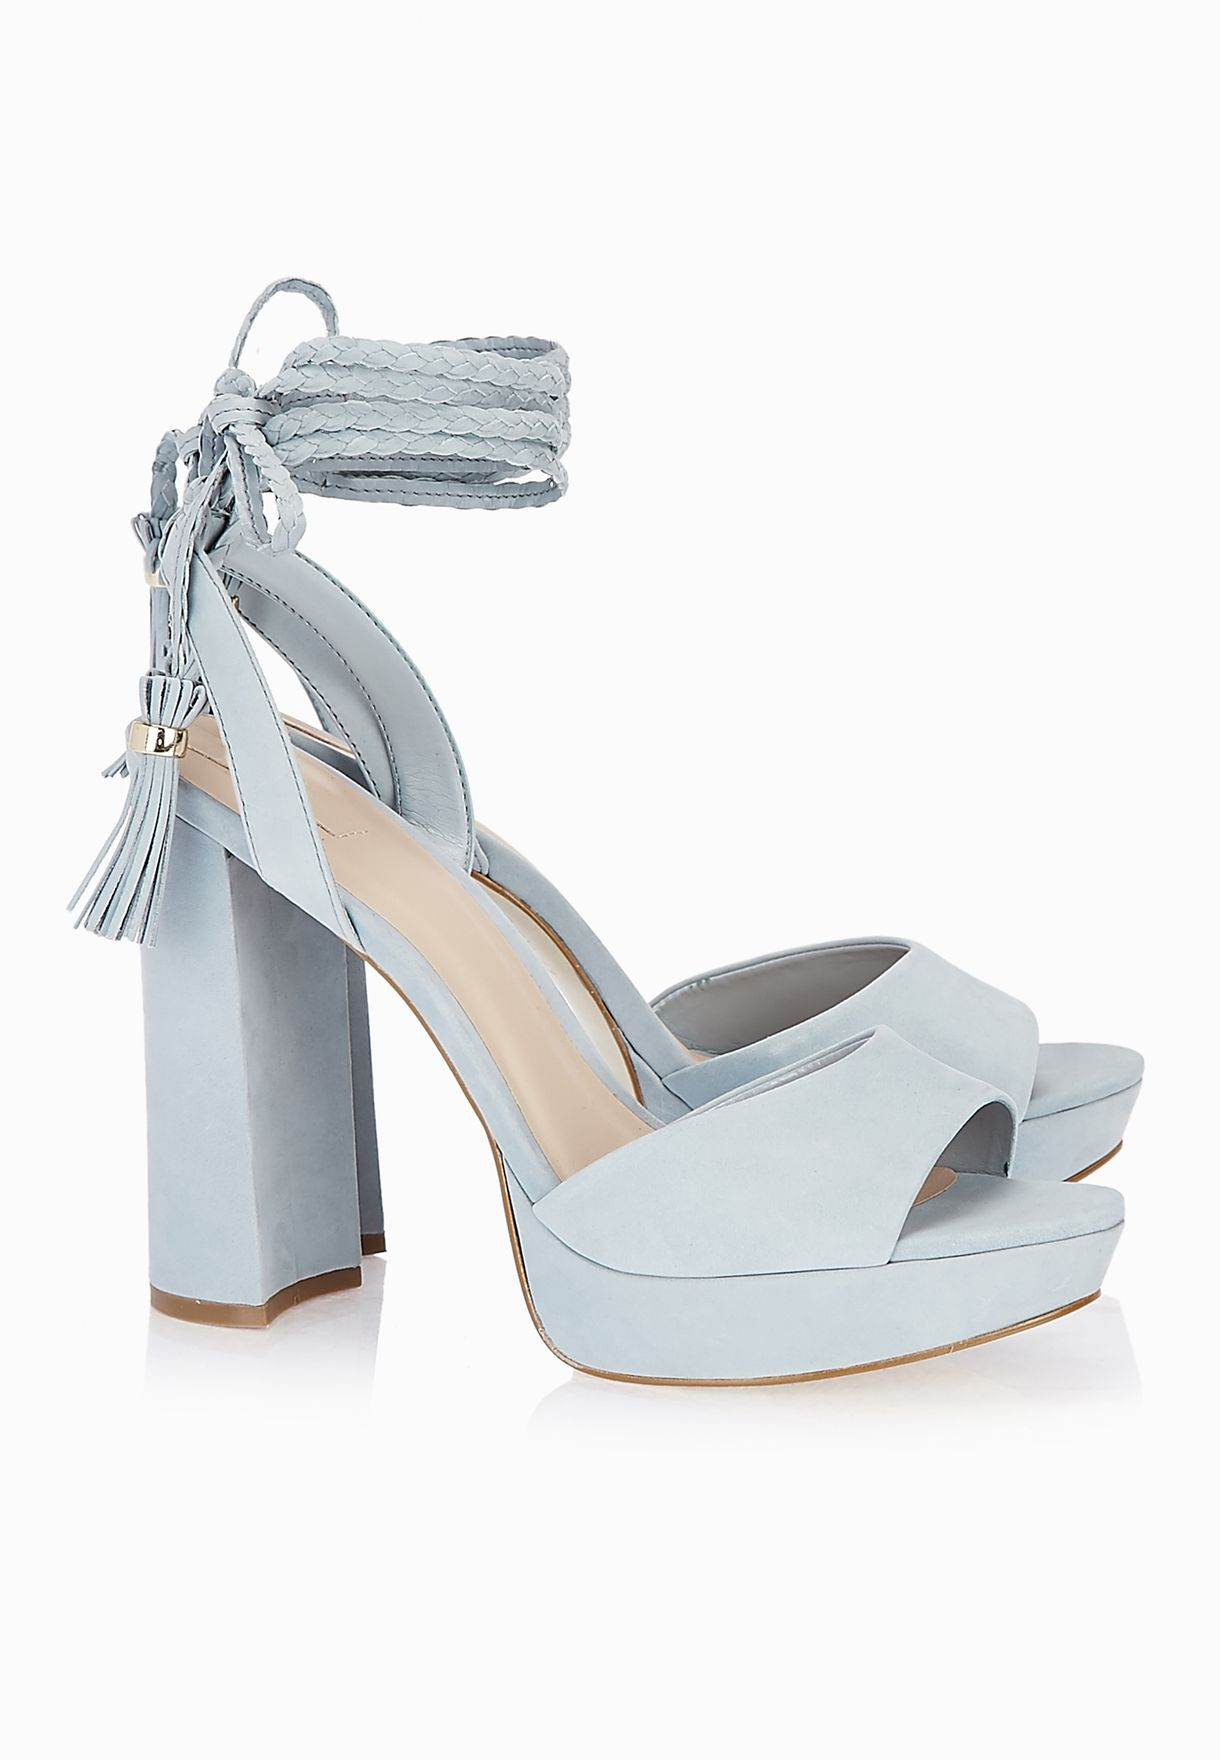 418c6a01ac Shop Aldo blue Chareri Tassel Block Heel Sandals for Women in UAE ...